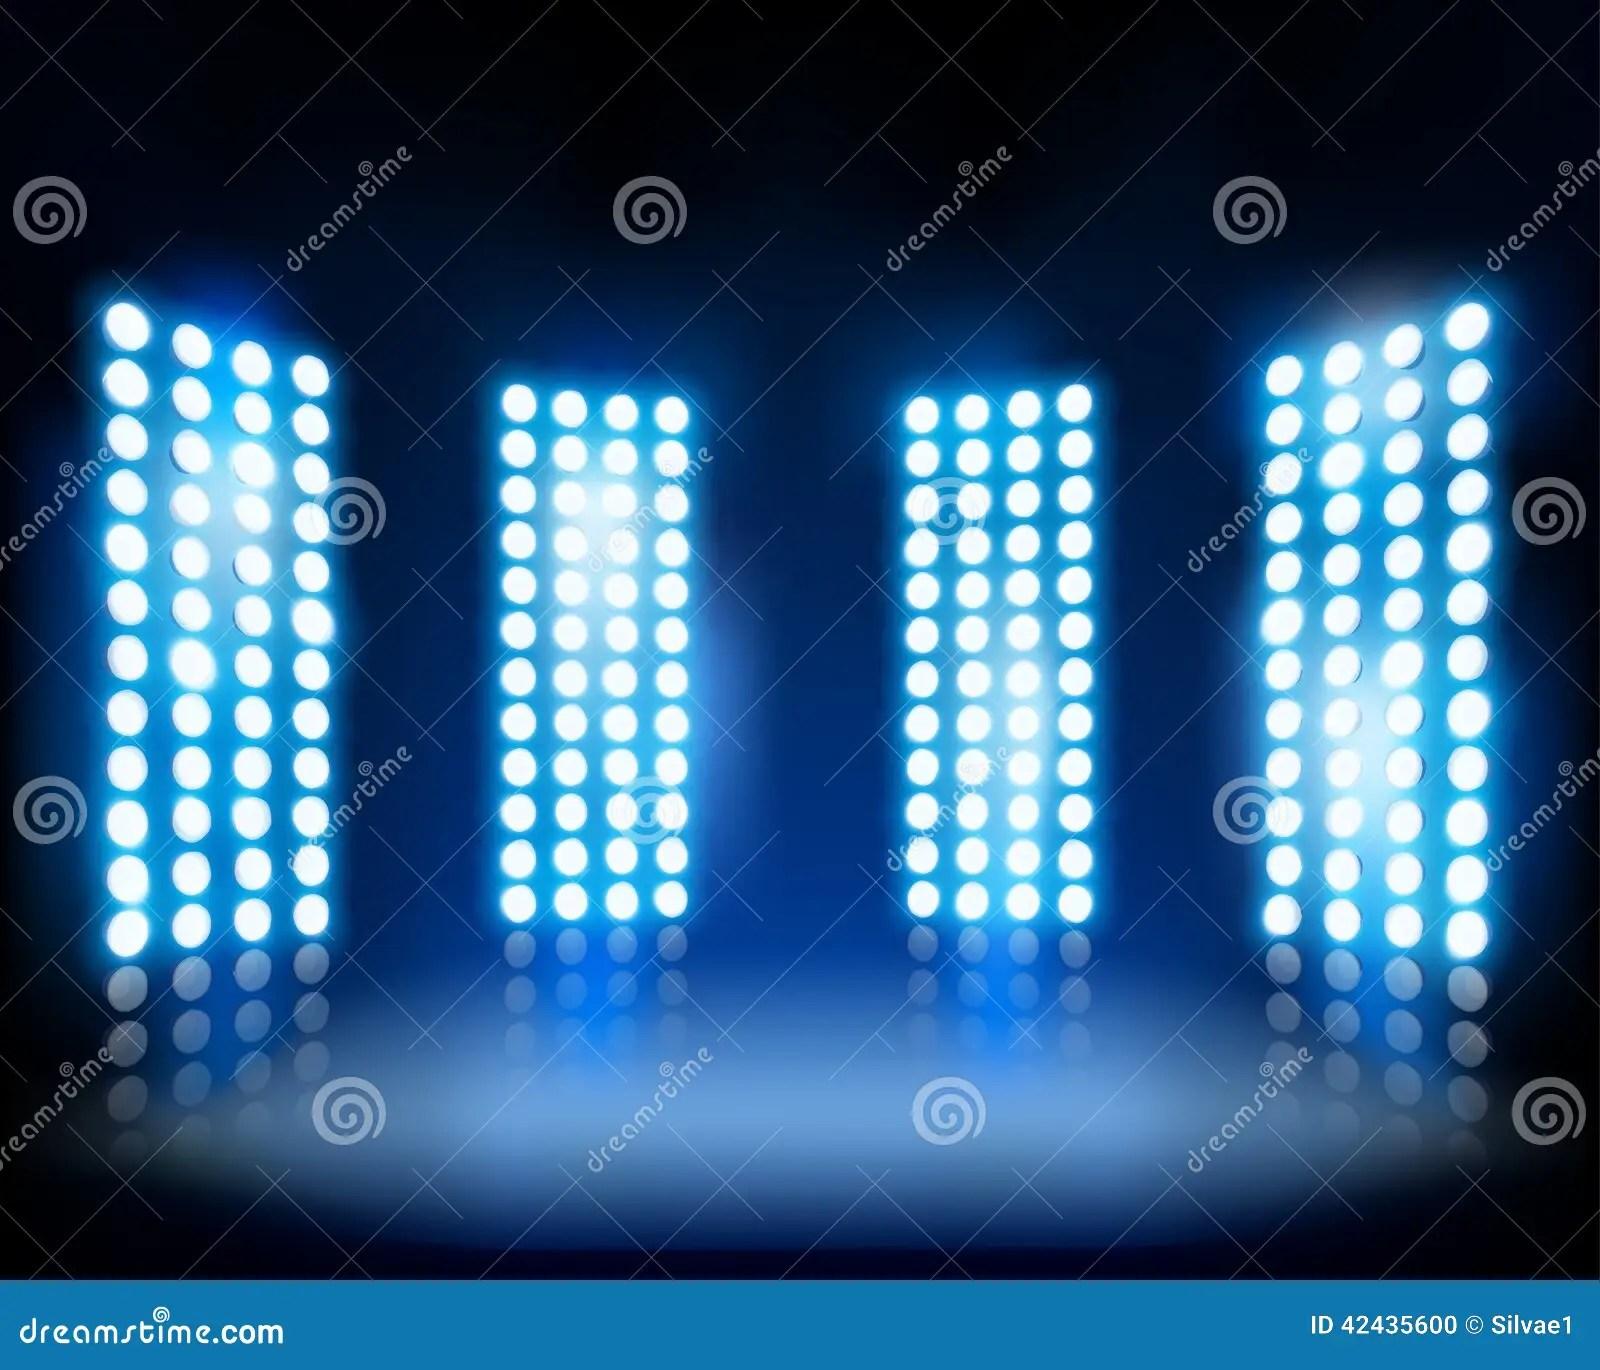 Led Display Floodlights